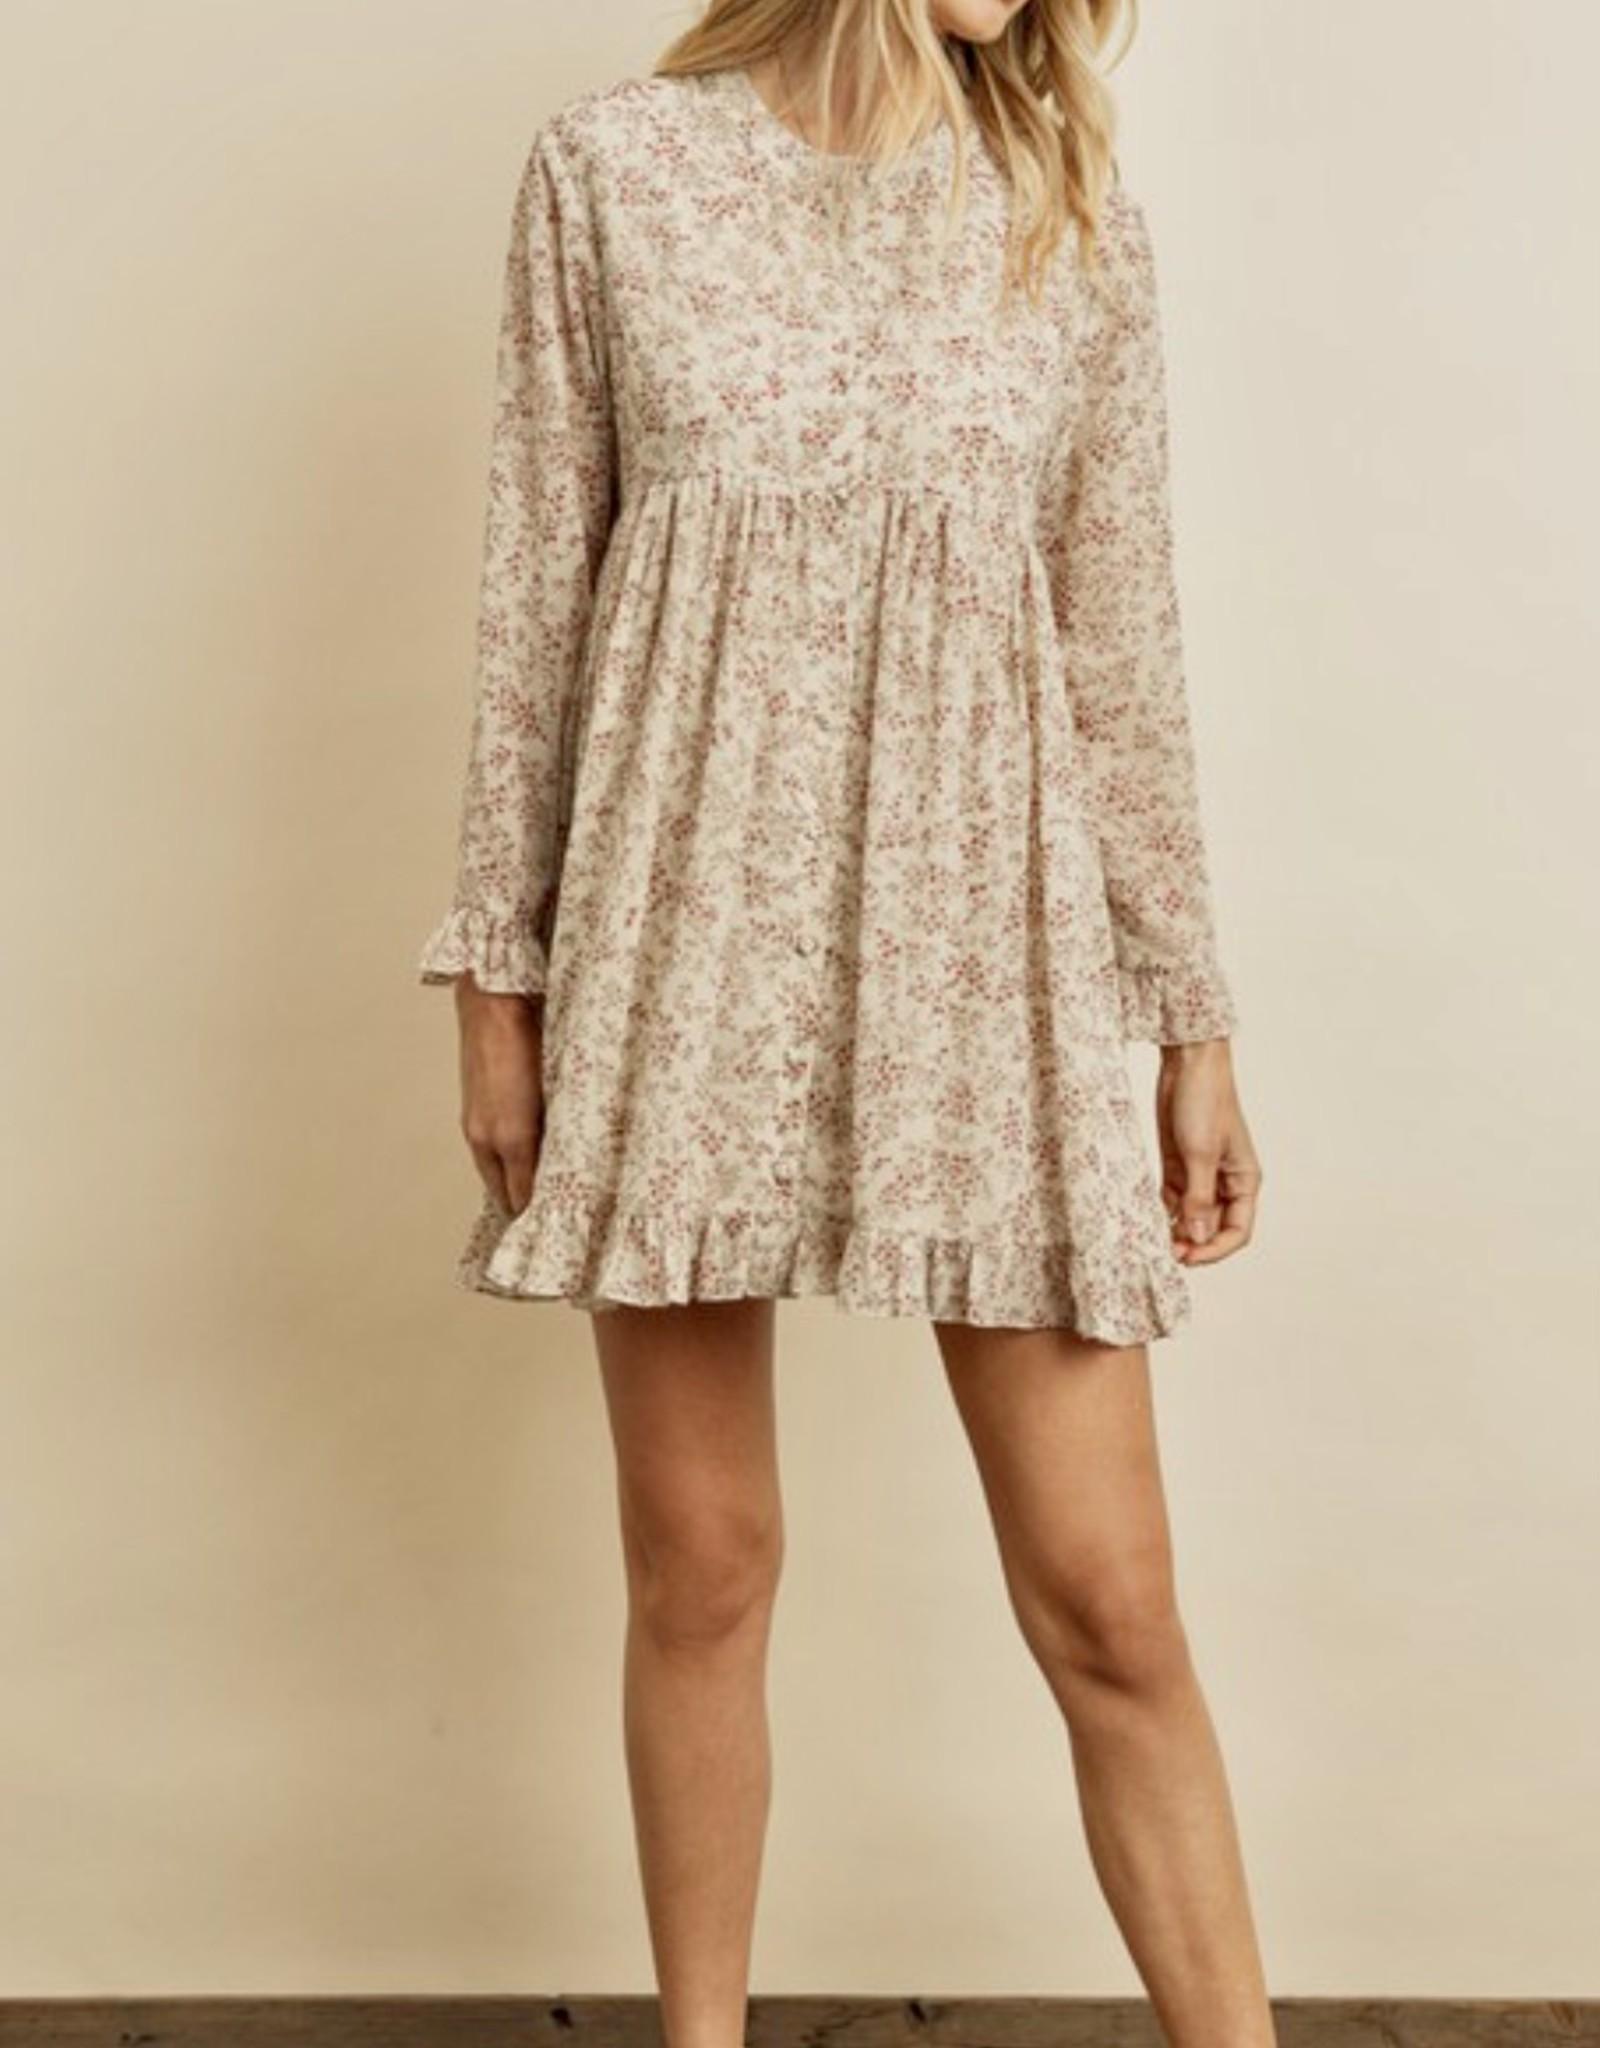 HUSH Floral print 3/4 sleeve babydoll dress